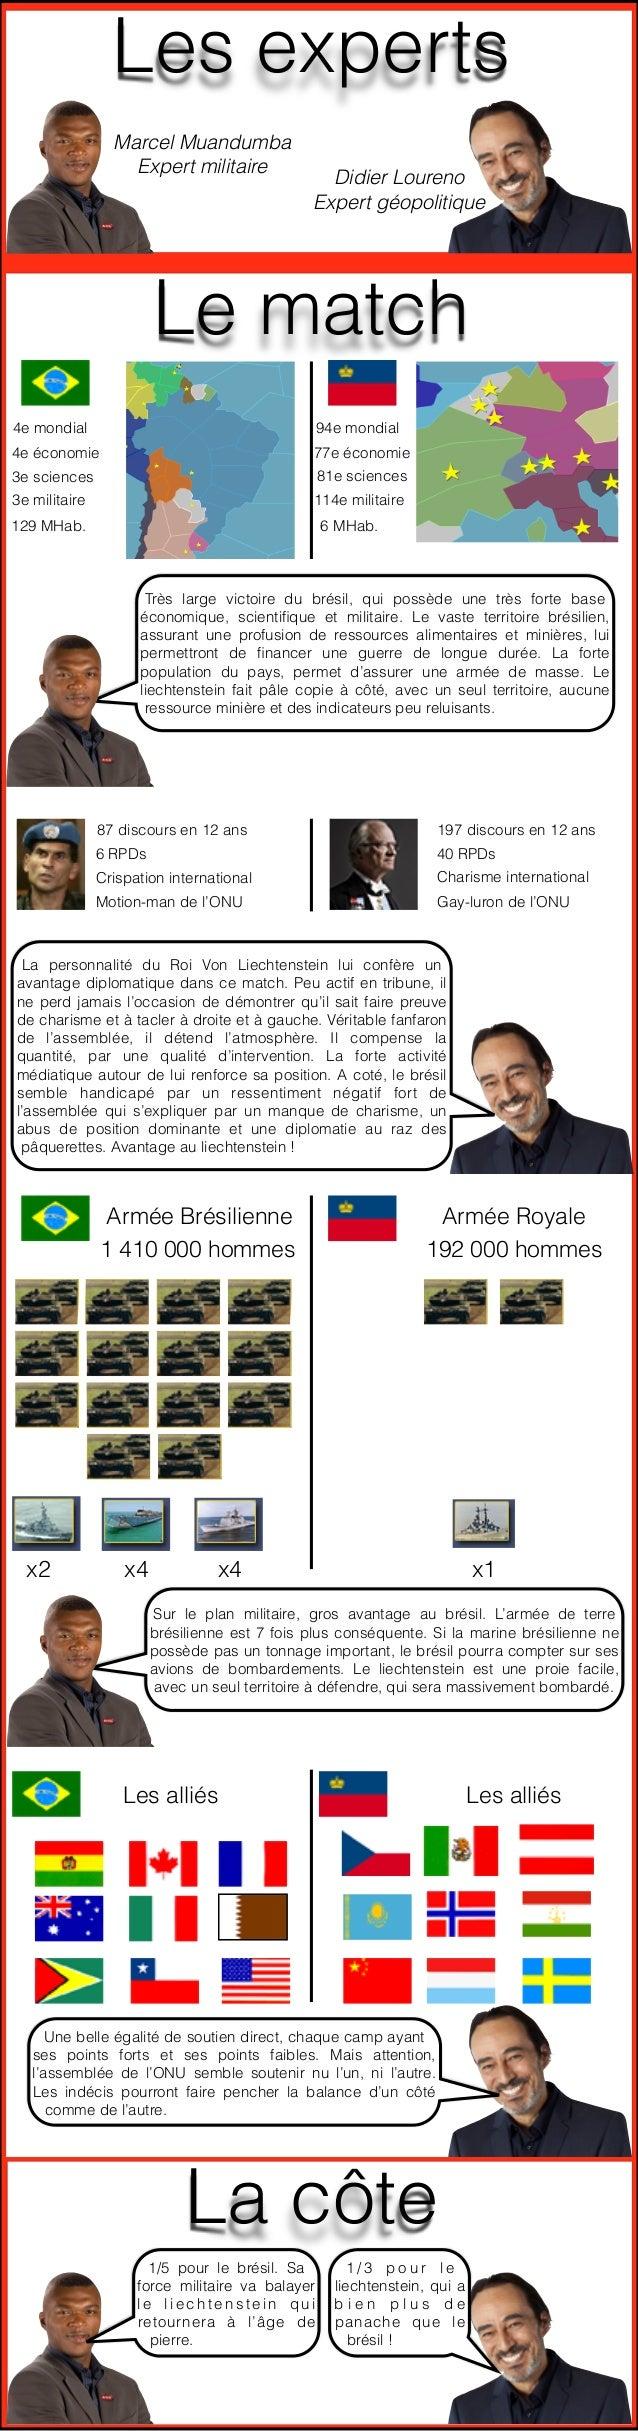 Les experts Marcel Muandumba Expert militaire Didier Loureno Expert géopolitique http:// www131.gnoodipl o.com/dist/img/ a...